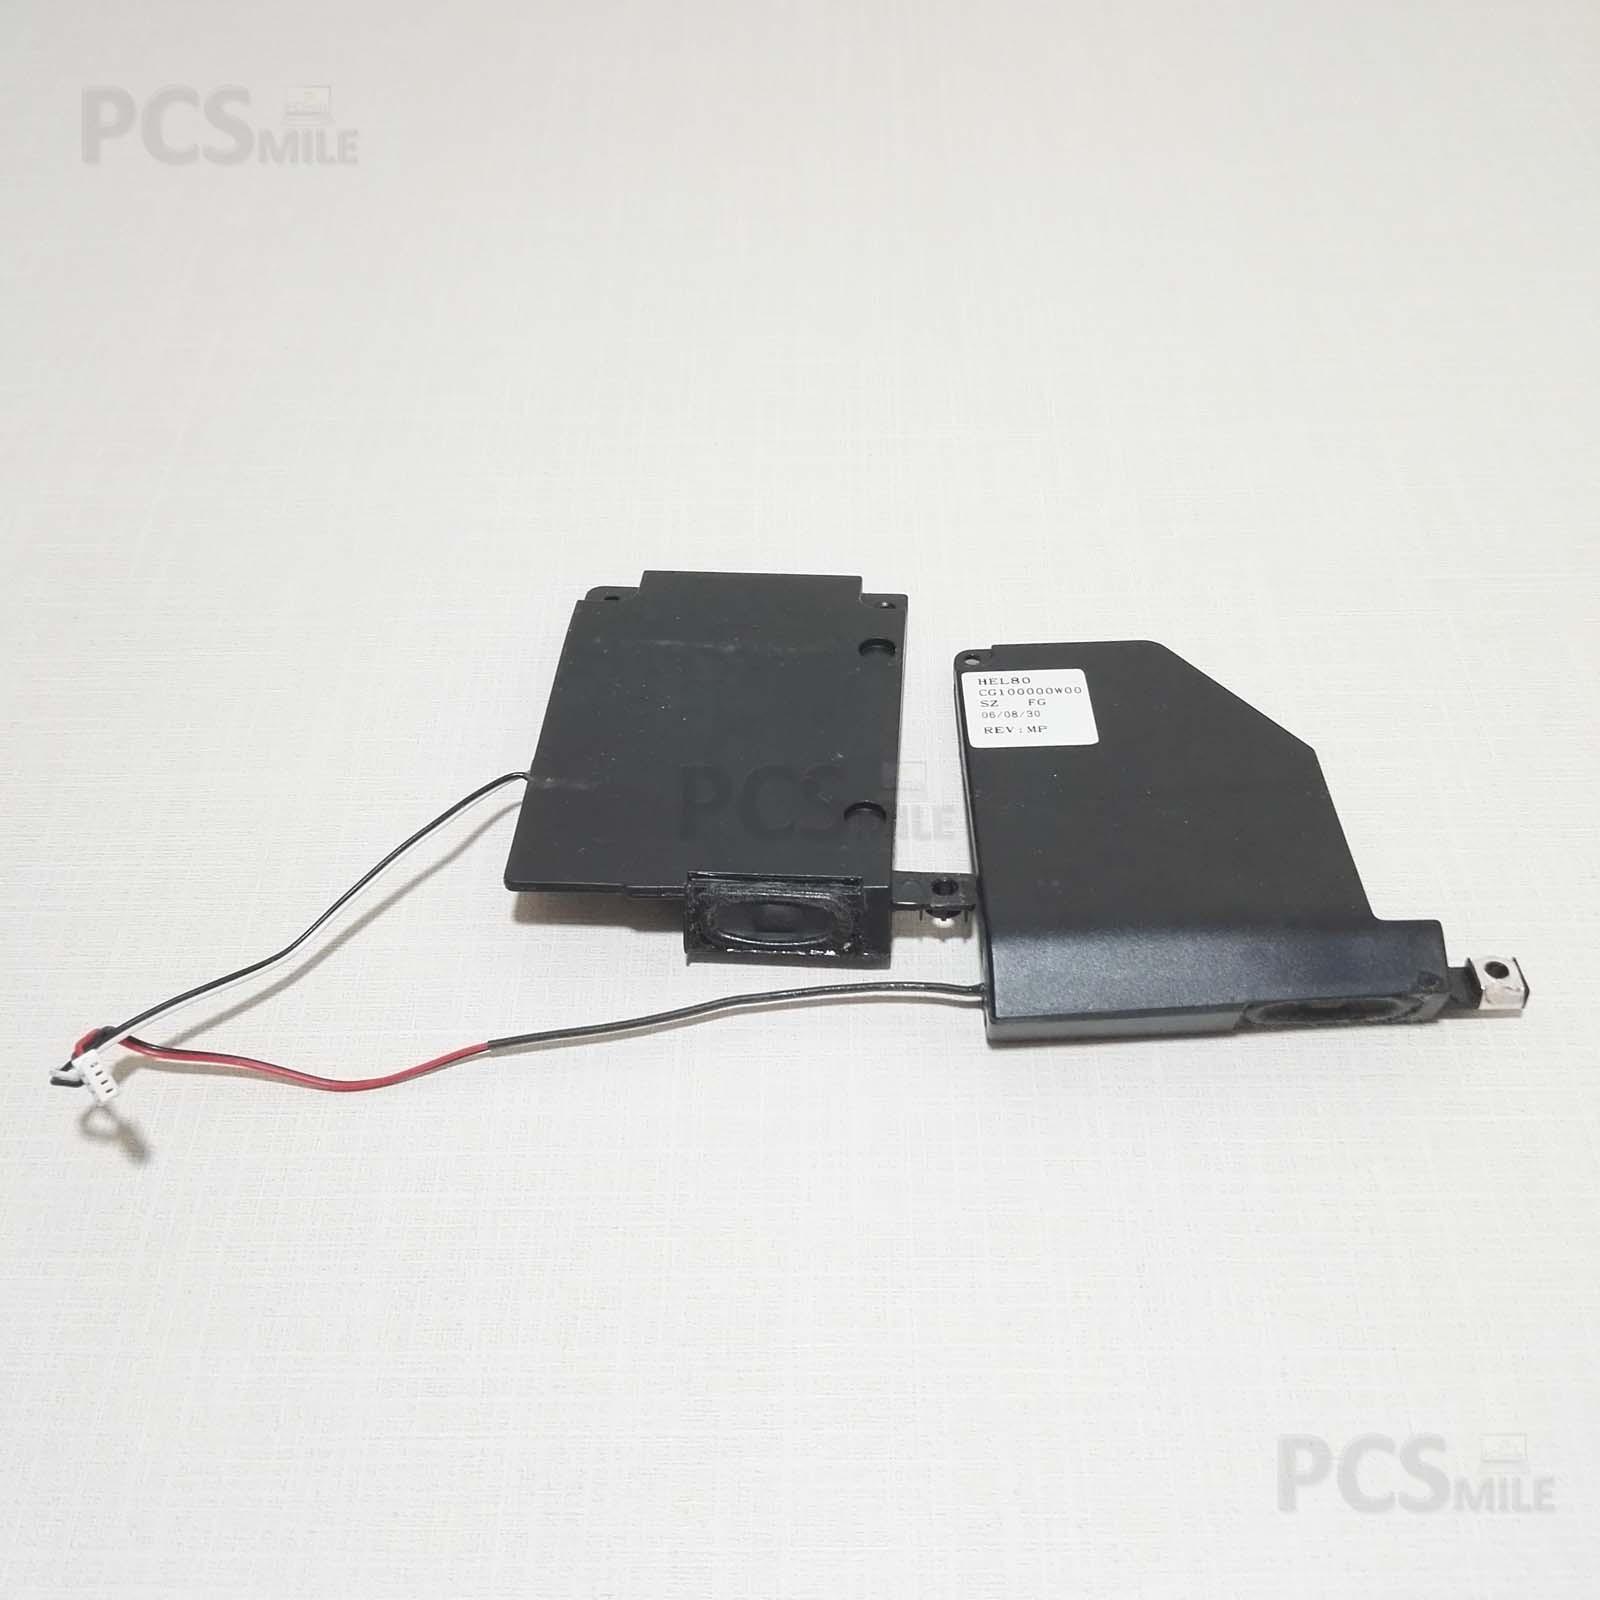 Speaker Olidata tehom CW4800 EL81 Casse HEL80 CG100000W00 audio altoparlante